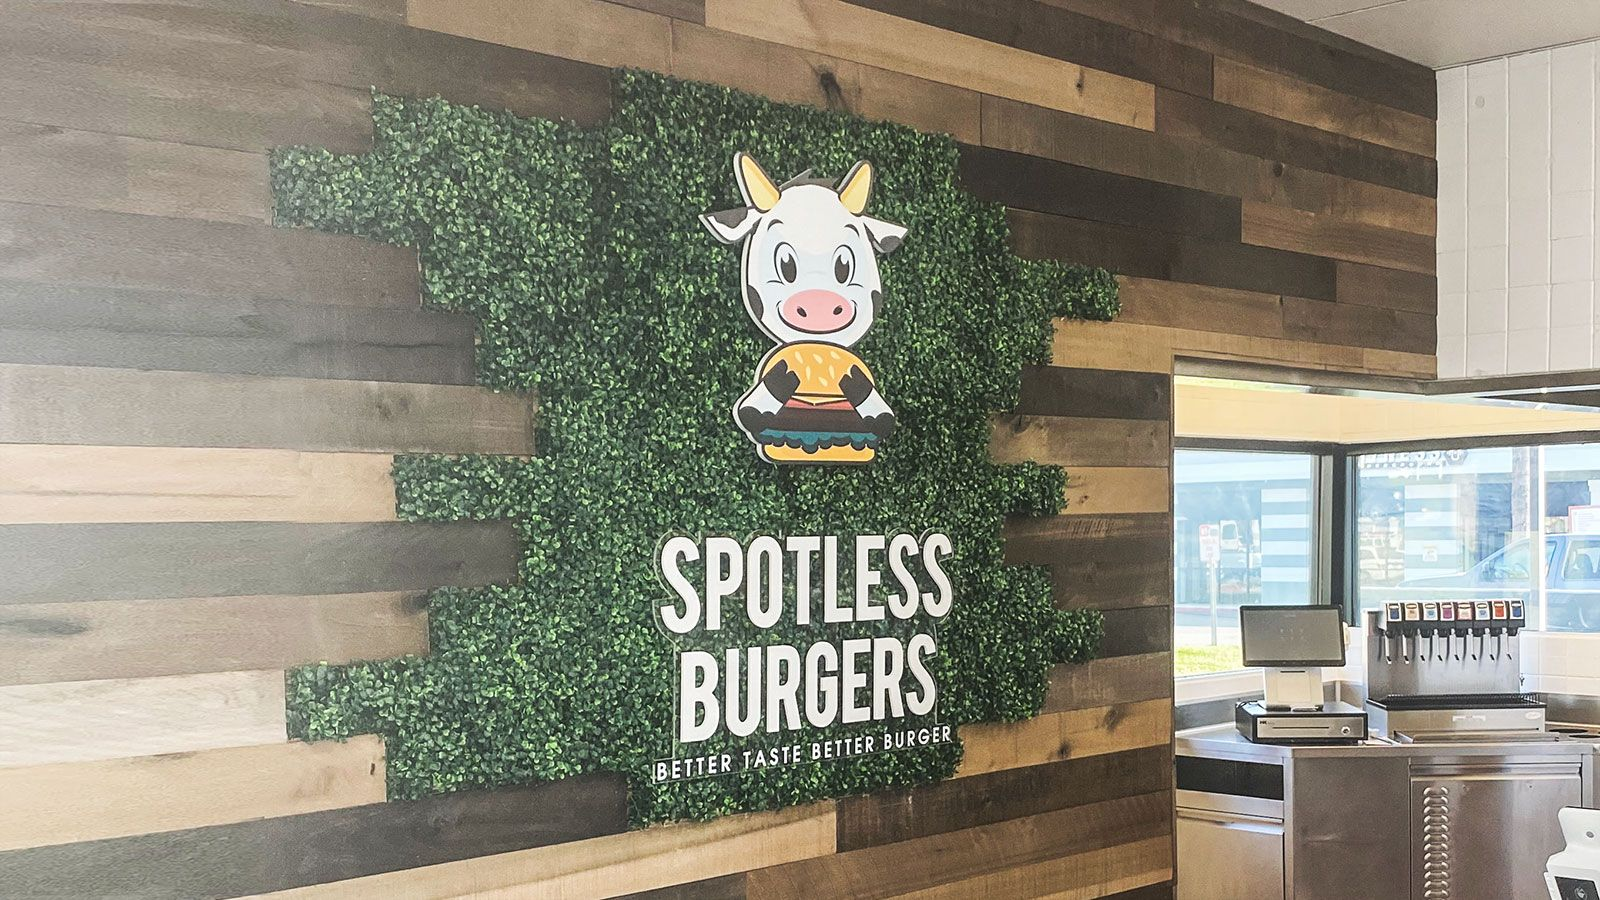 Spotless burgers 3D letters